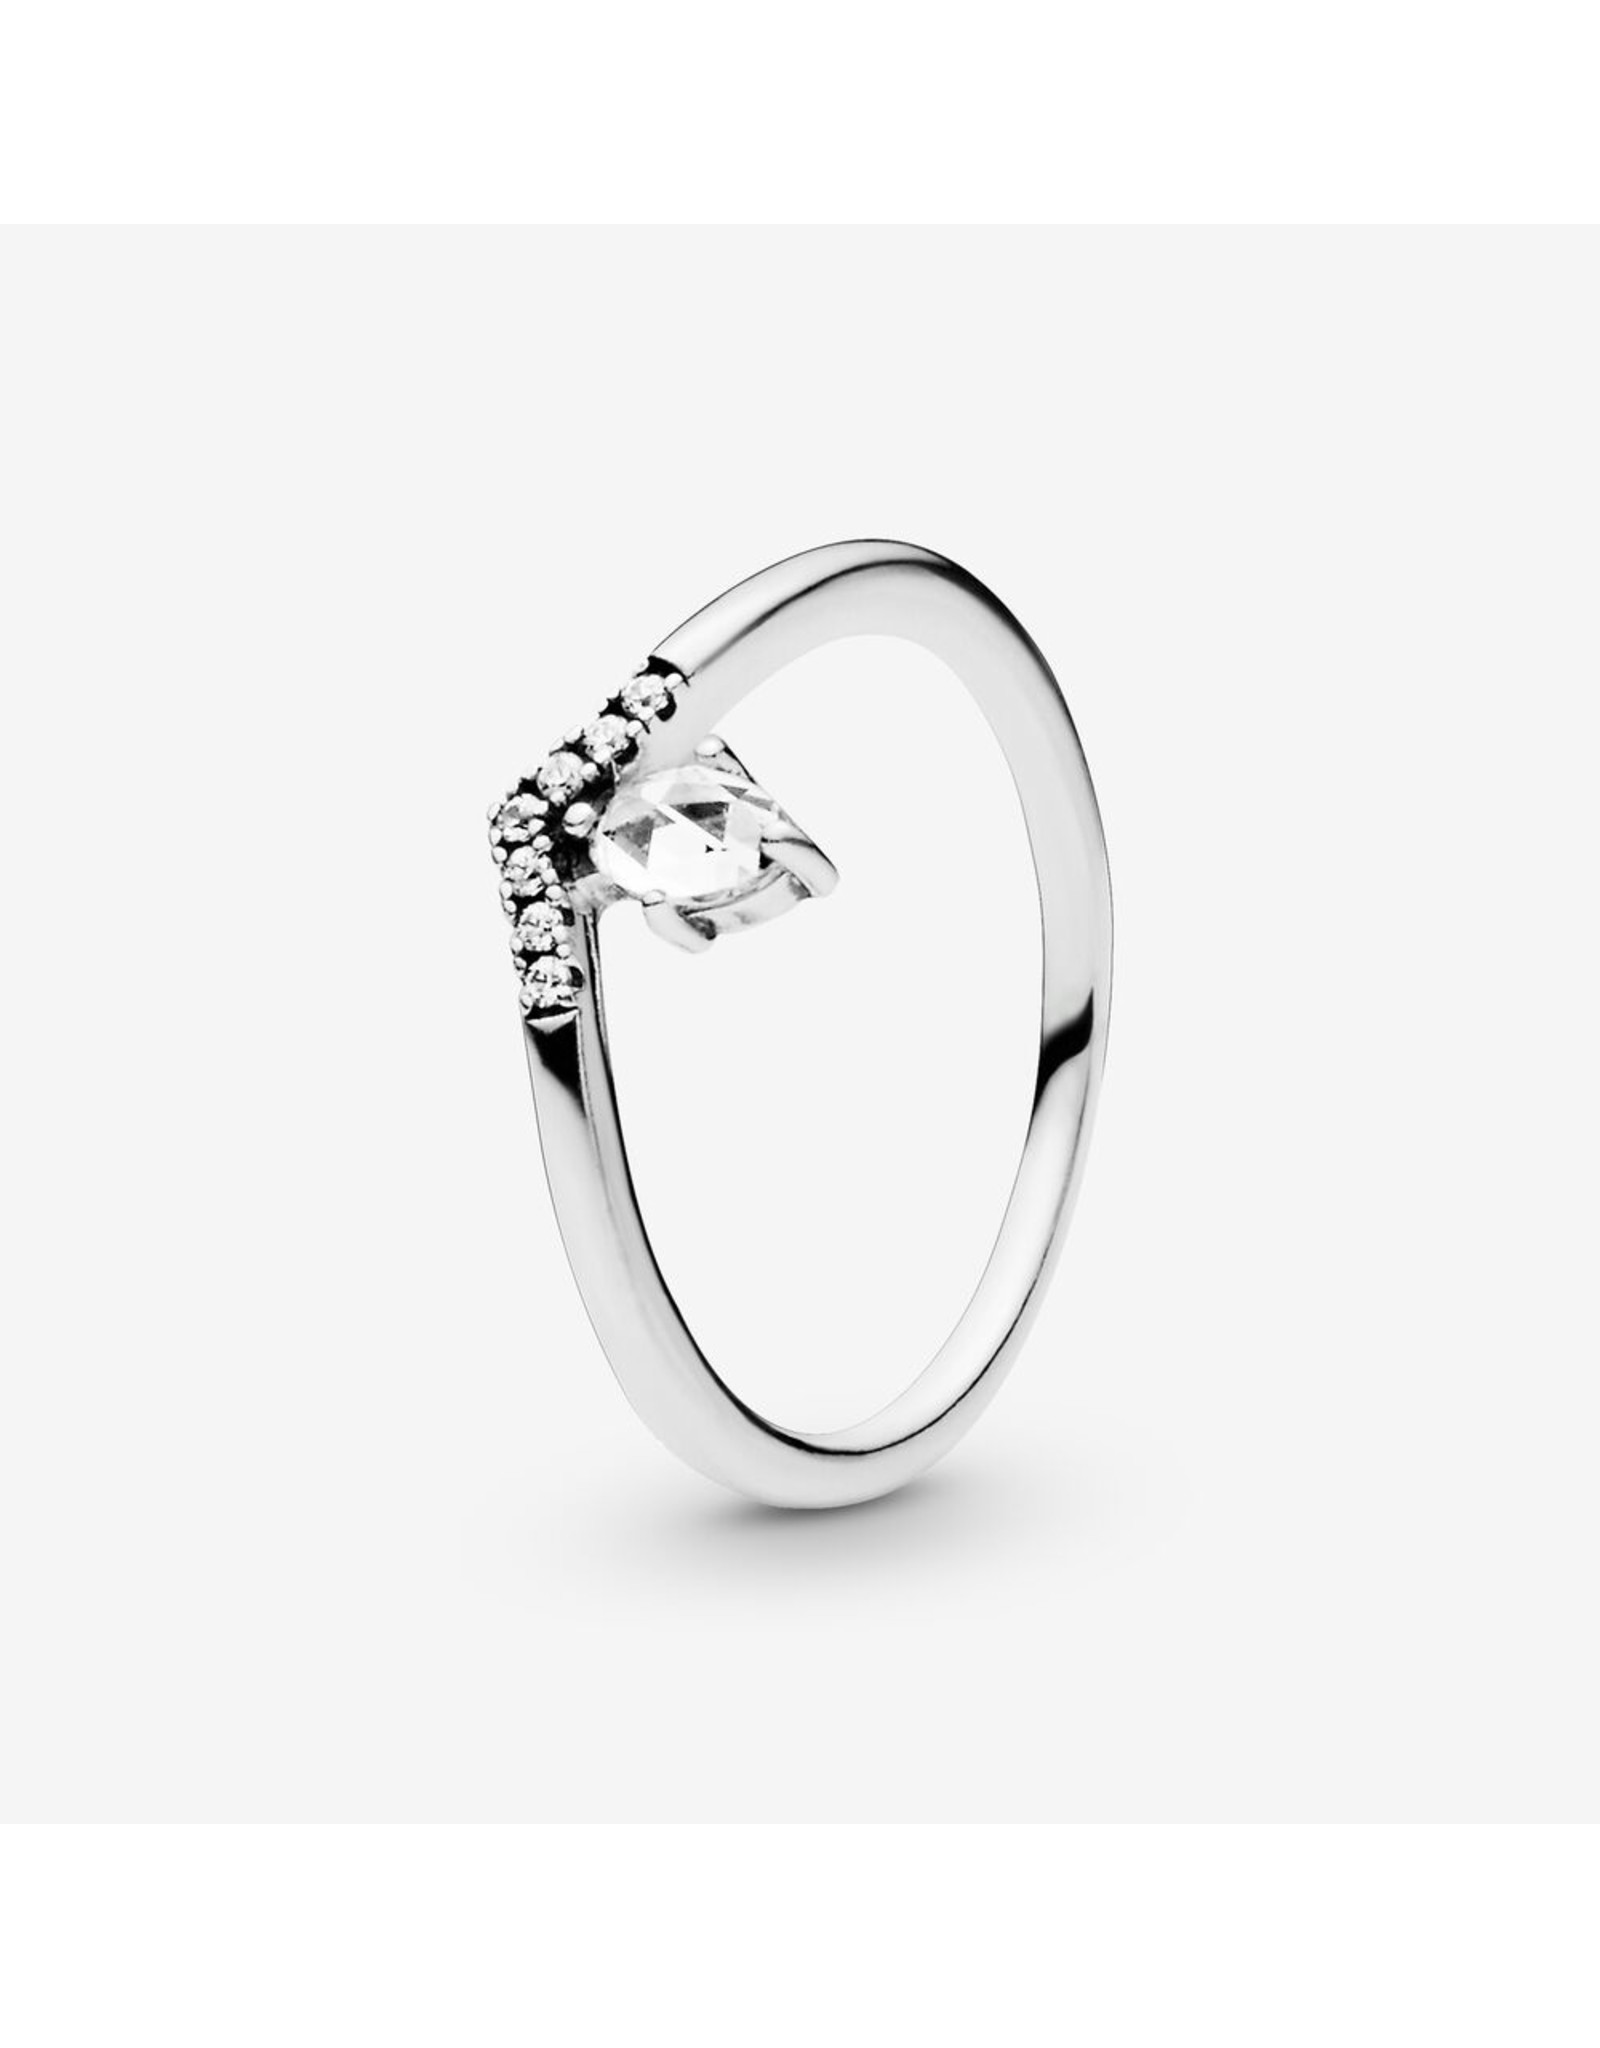 Pandora Pandora Ring,197790CZ Classic Wish, Clear CZ